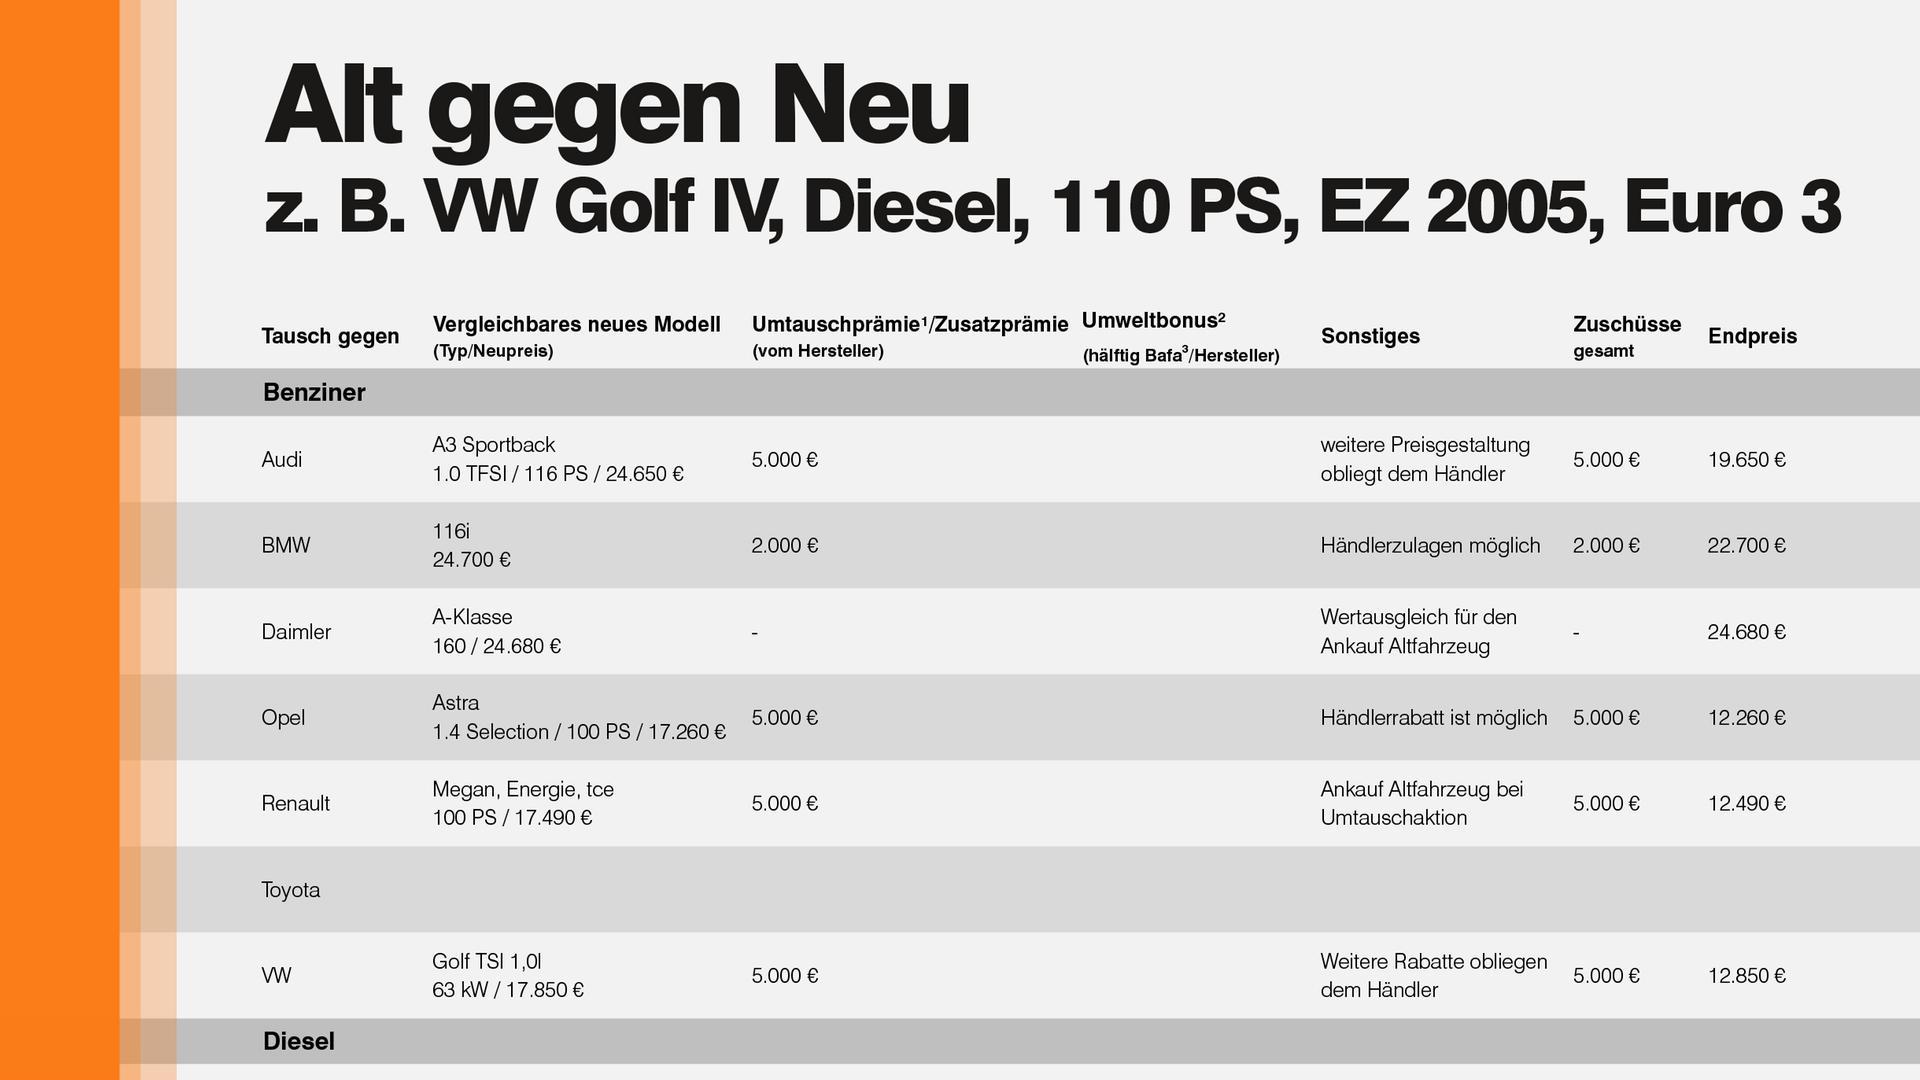 Groß Drahtstärke Stromstärke Diagramm Ideen - Die Besten ...